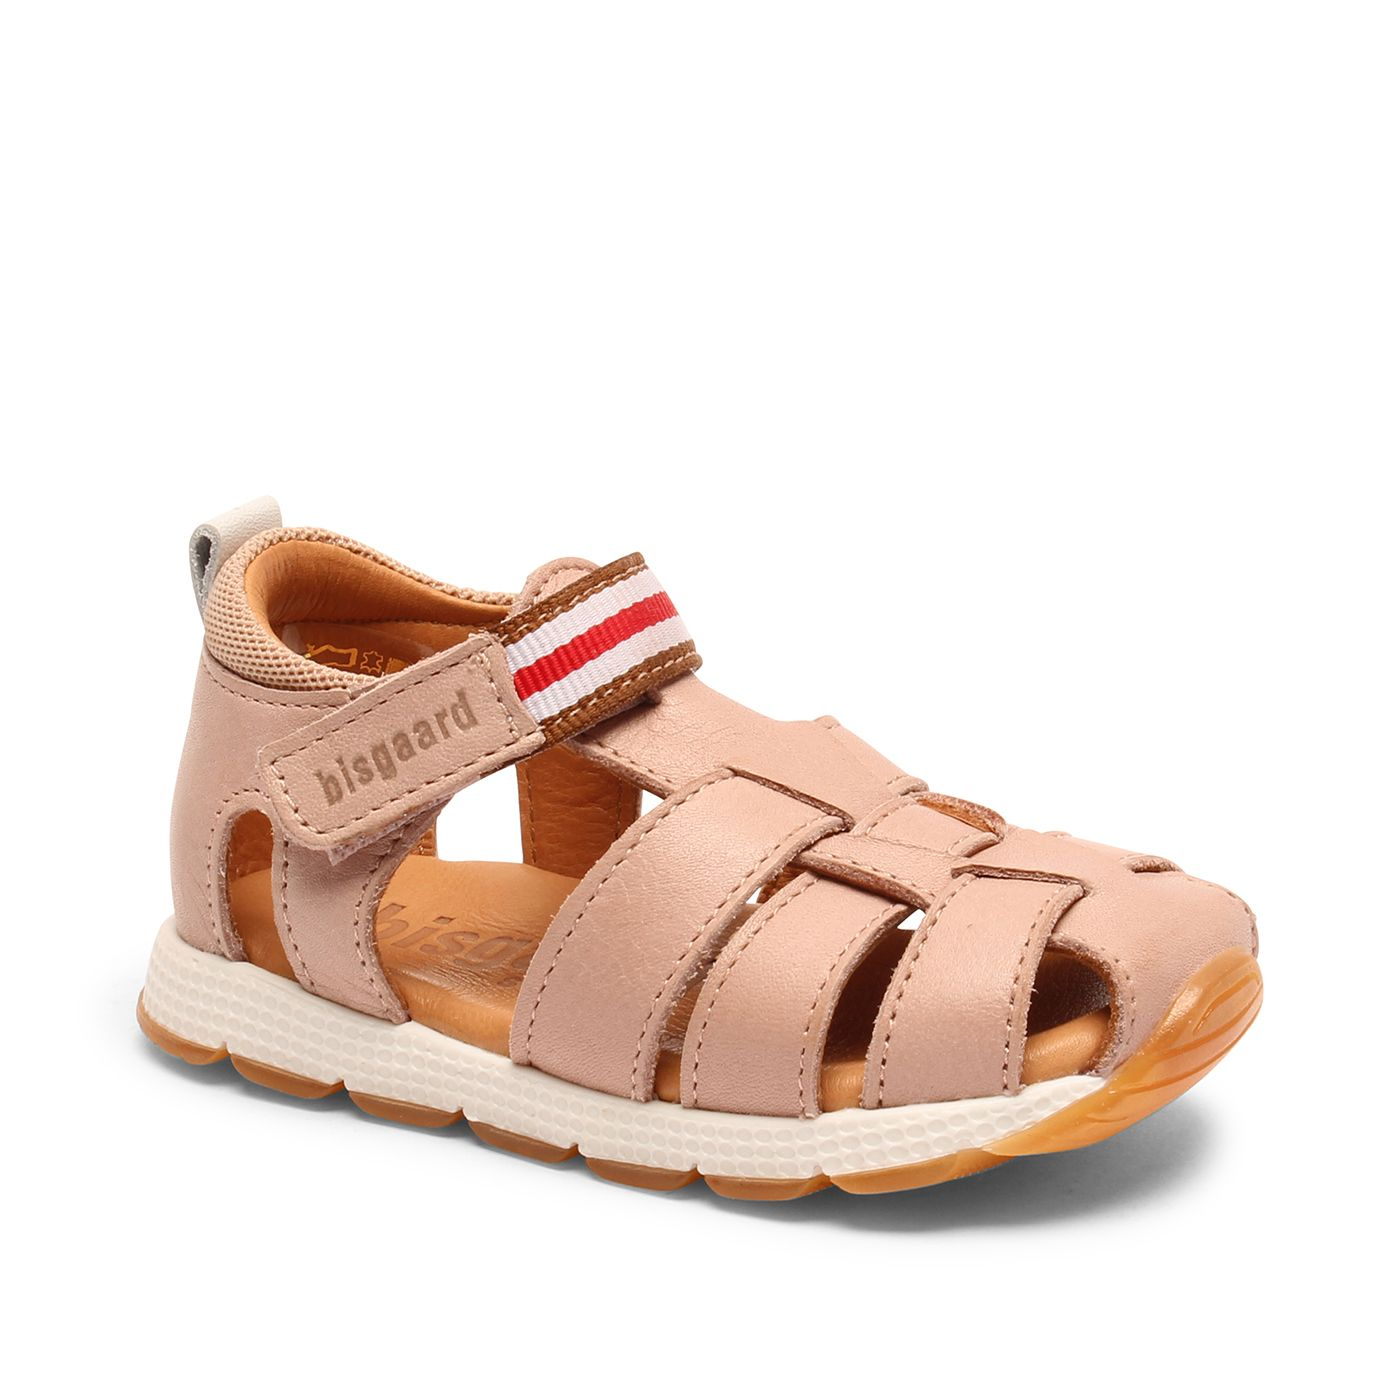 Bisgaard dívčí kožené sandály 71241 - 1629